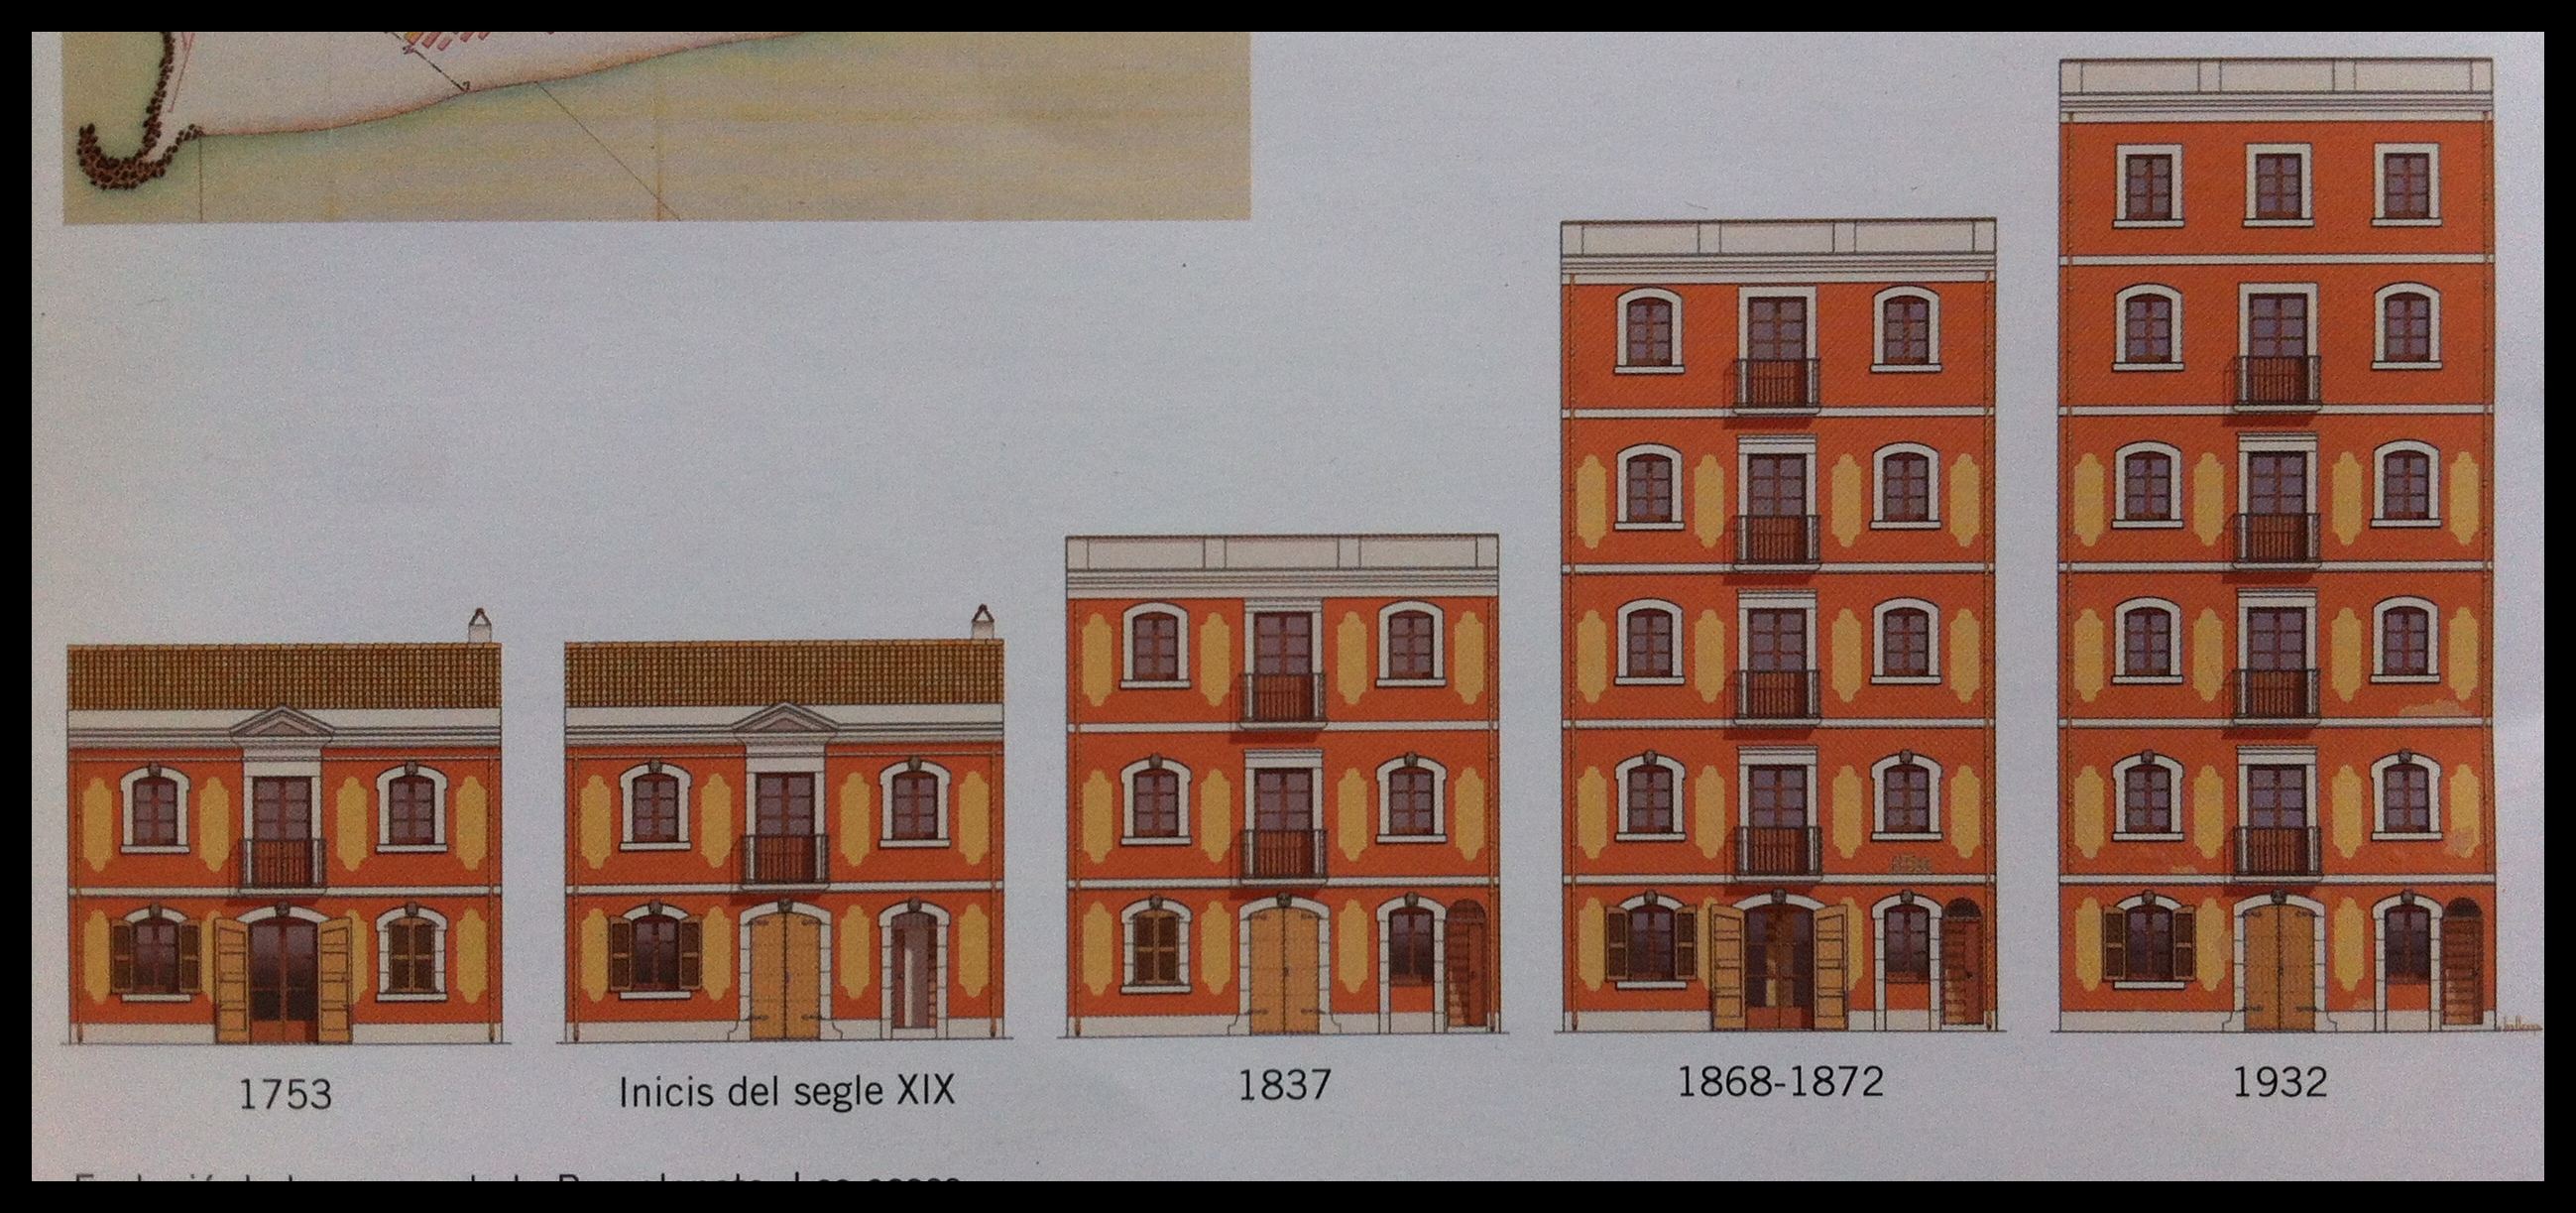 La casa de la barceloneta 1761 unica barcelona - Inmobiliaria la casa barcelona ...